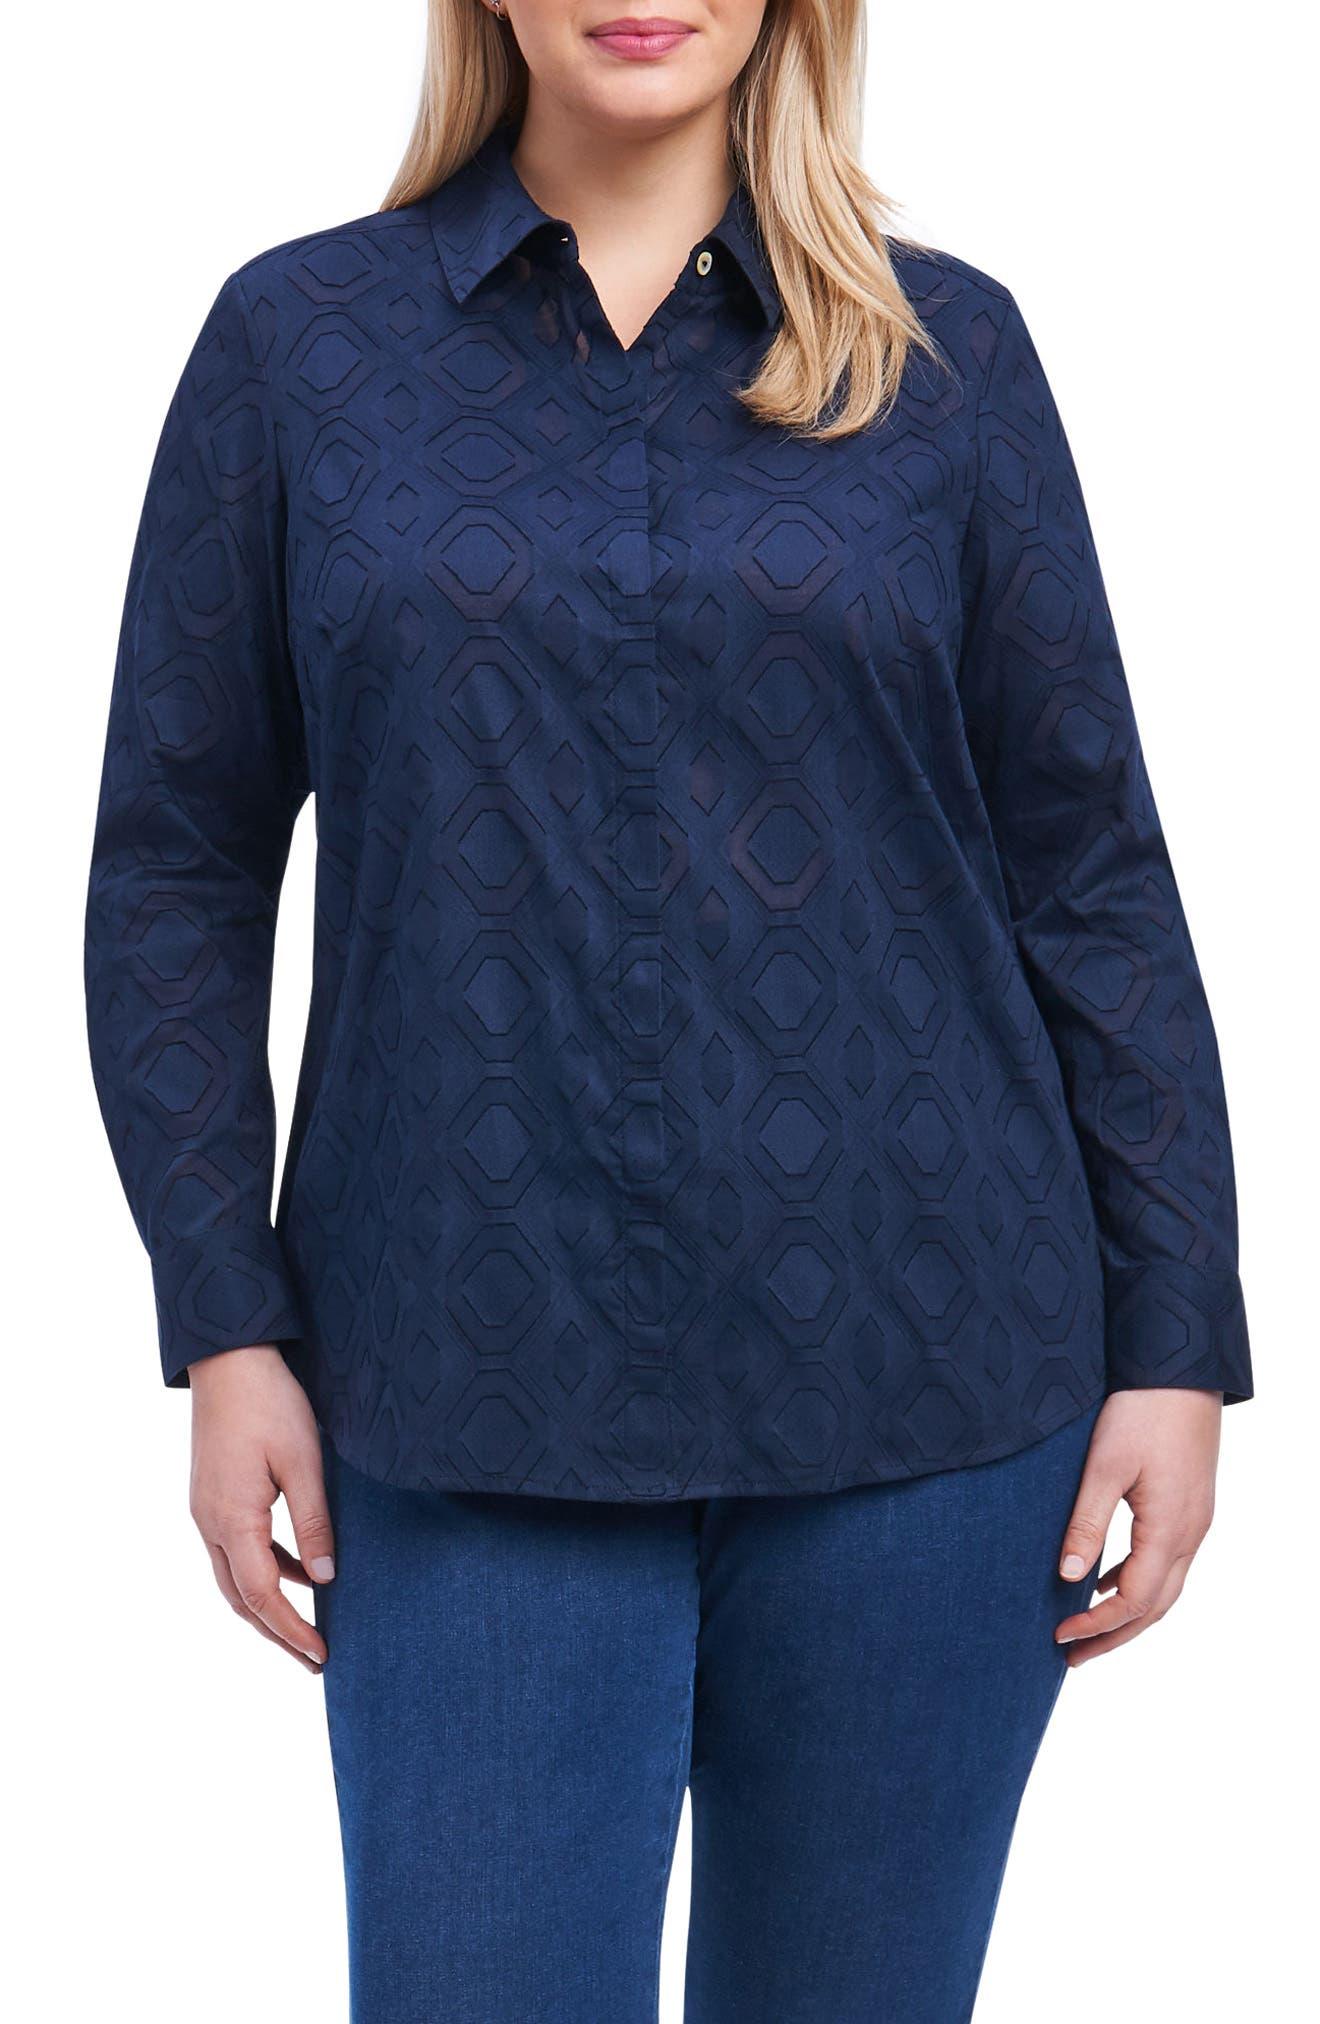 Alternate Image 1 Selected - Foxcroft Ava Diamond Clip Jacquard Shirt (Plus Size)